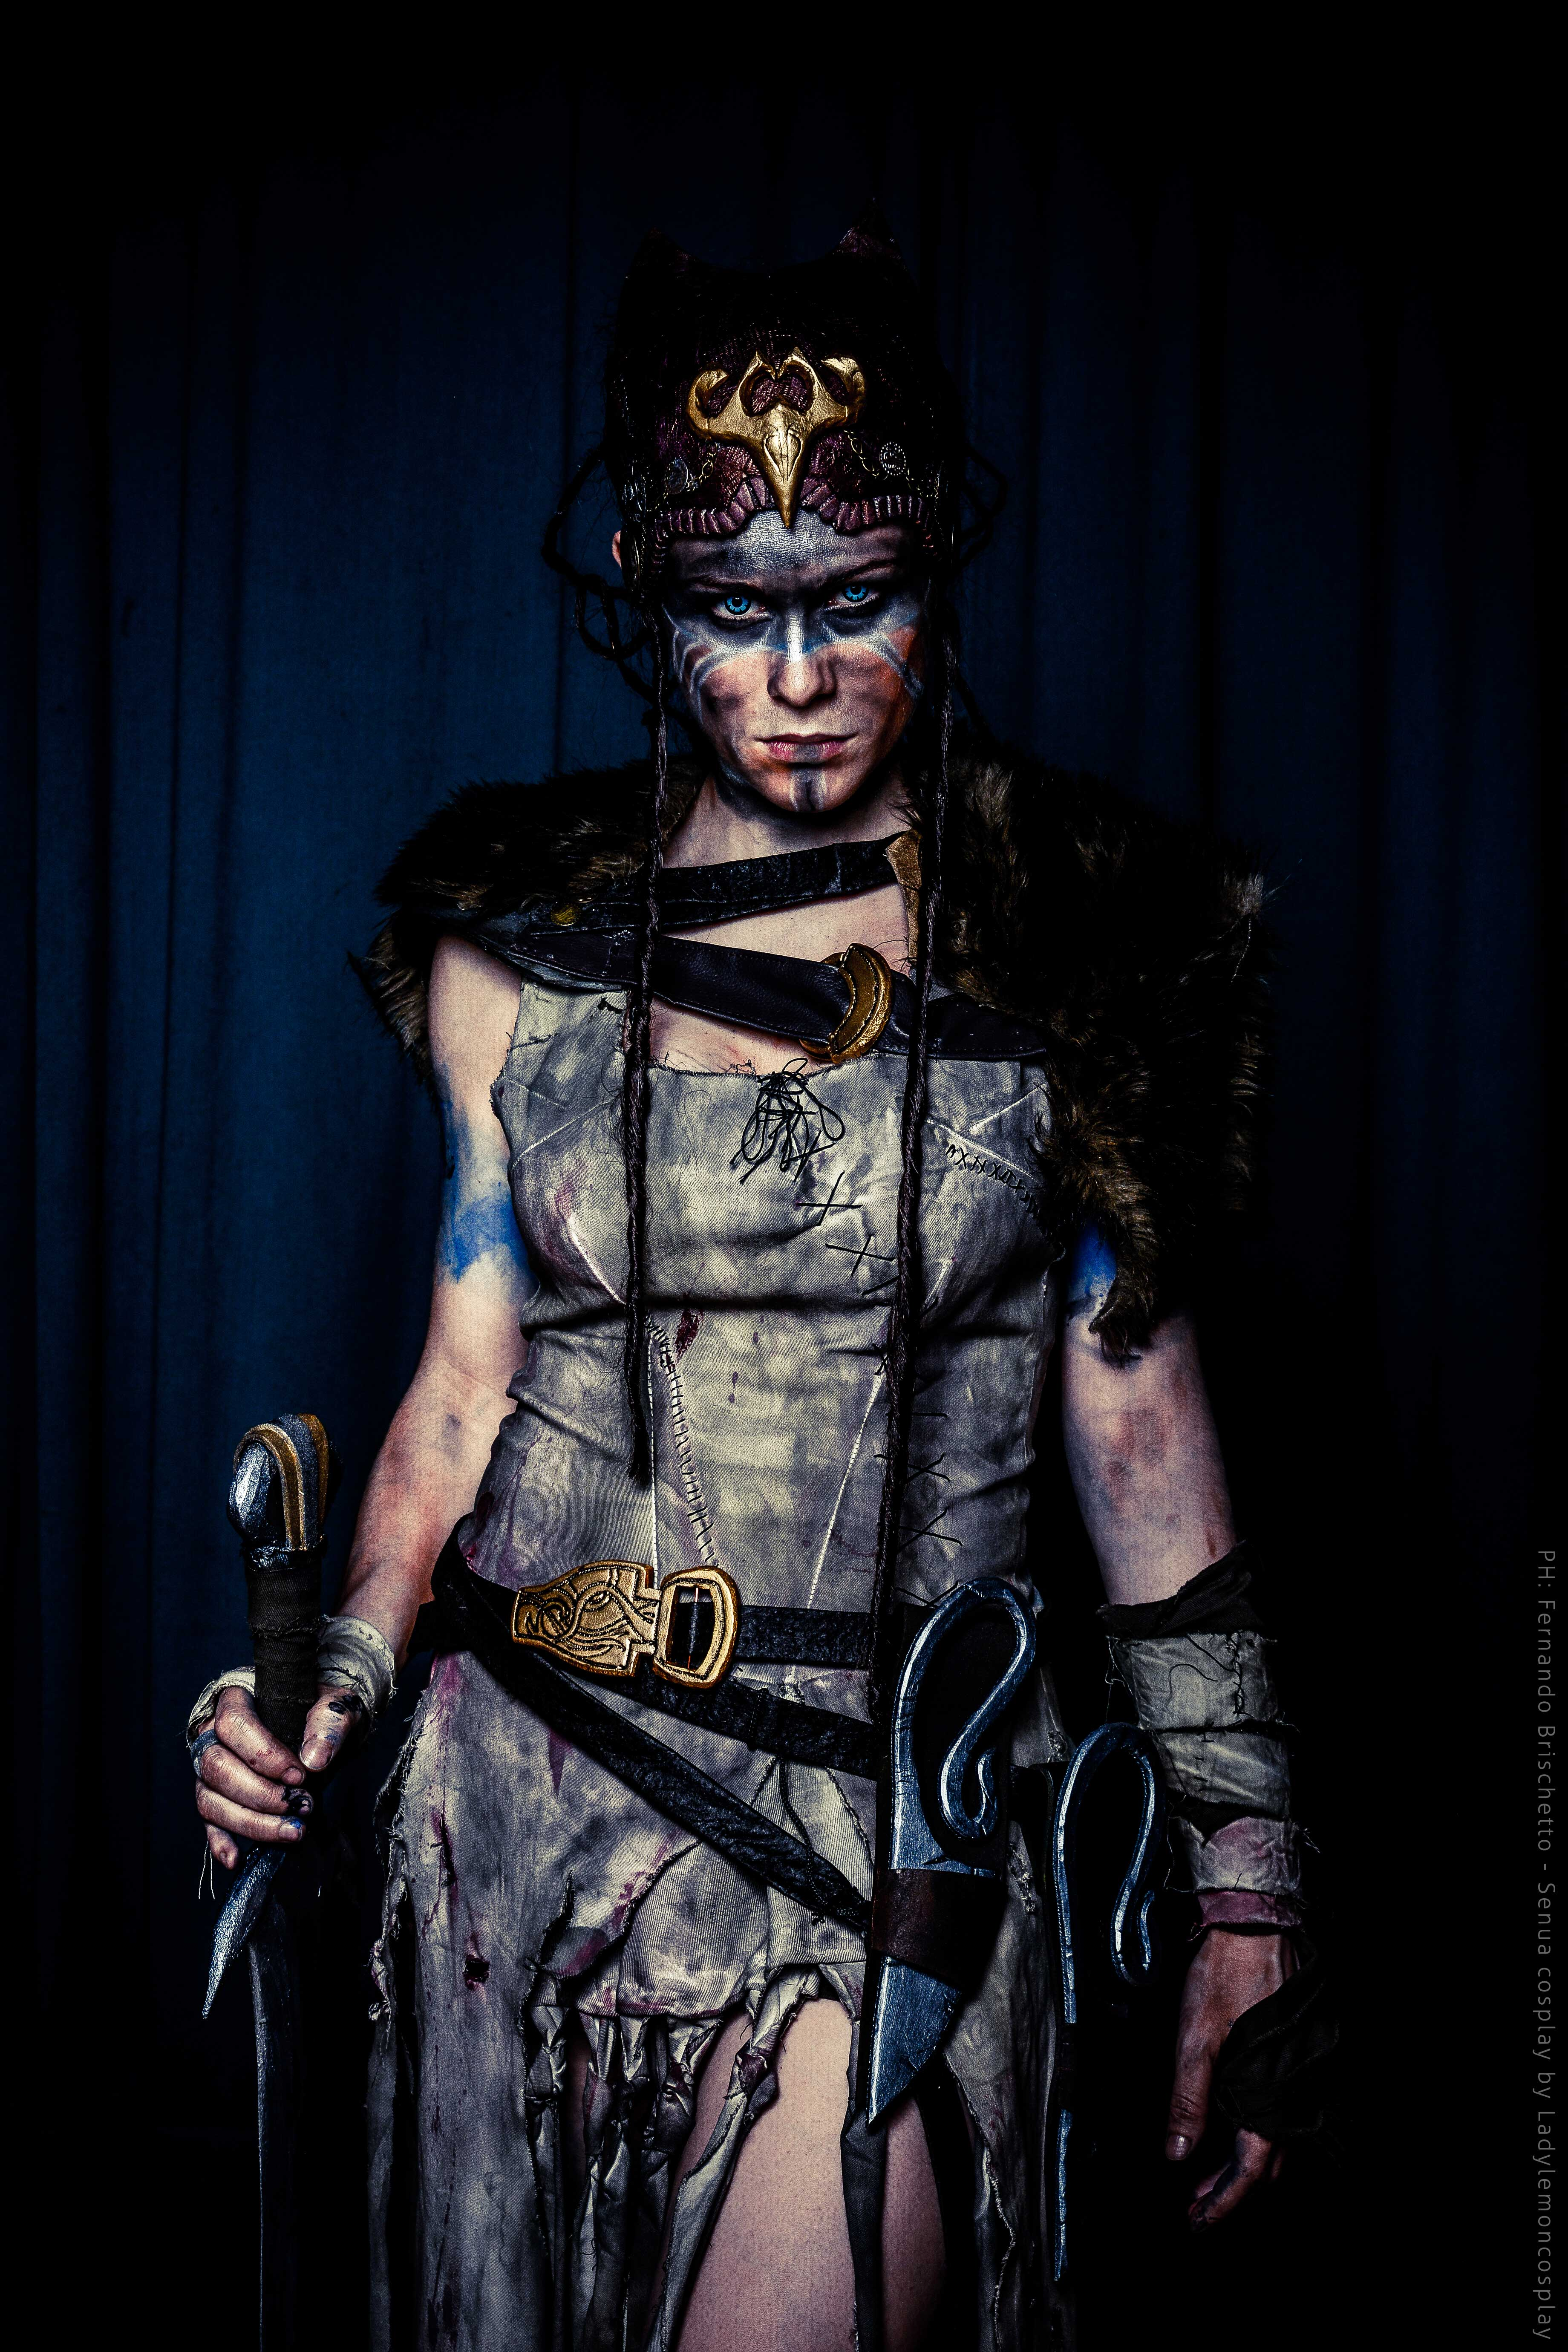 Hellblade Senua Cosplay Queen Assassin Starring LadyLemon